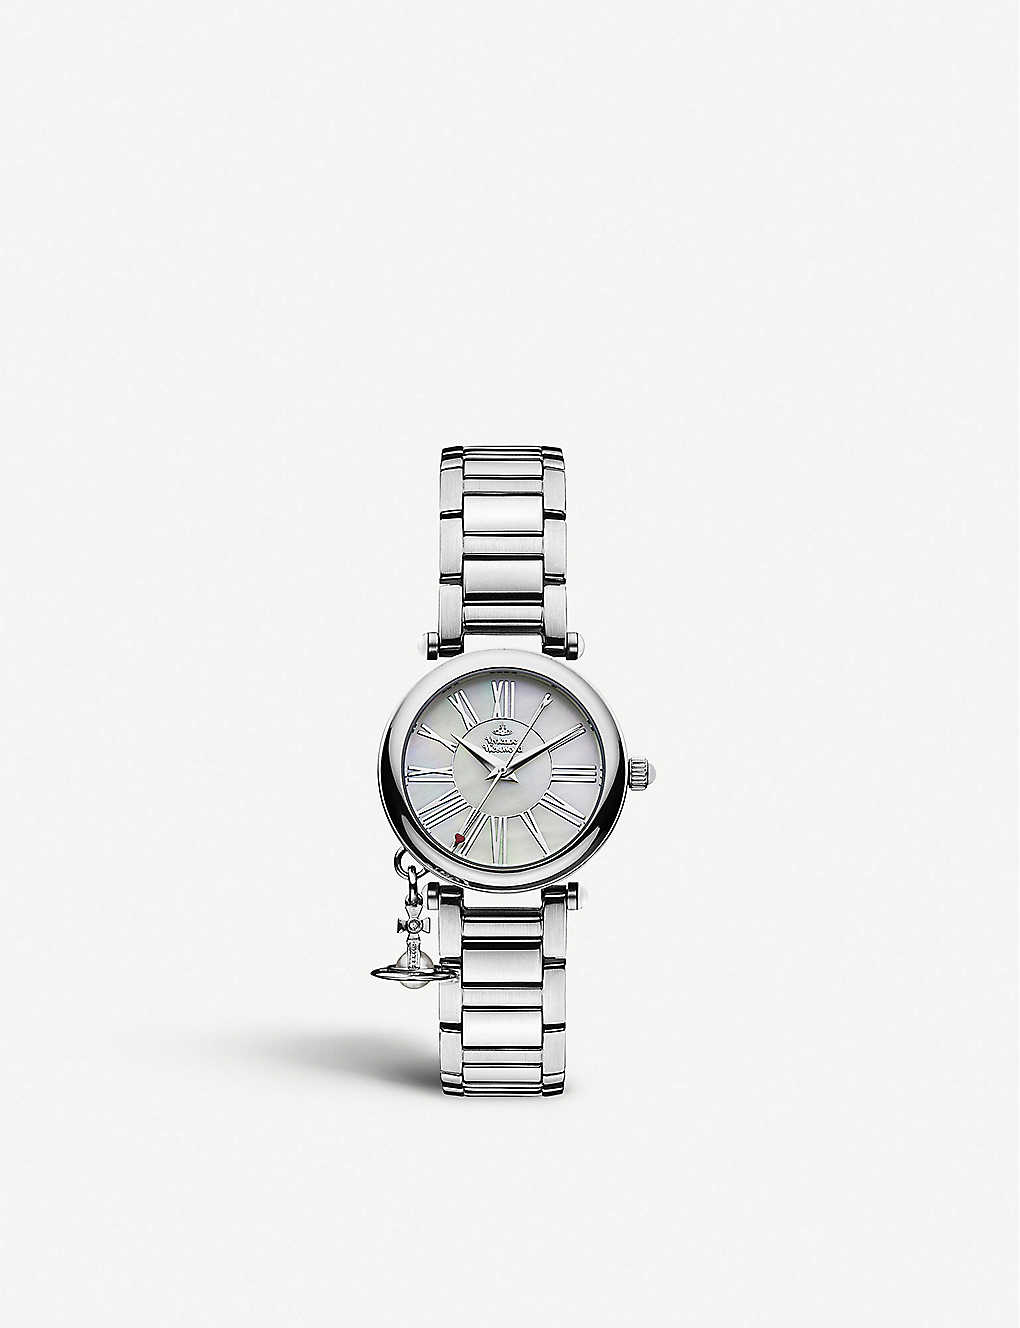 72cbbdaff41 VIVIENNE WESTWOOD - VV006PSLSL Mother Orb stainless steel watch ...